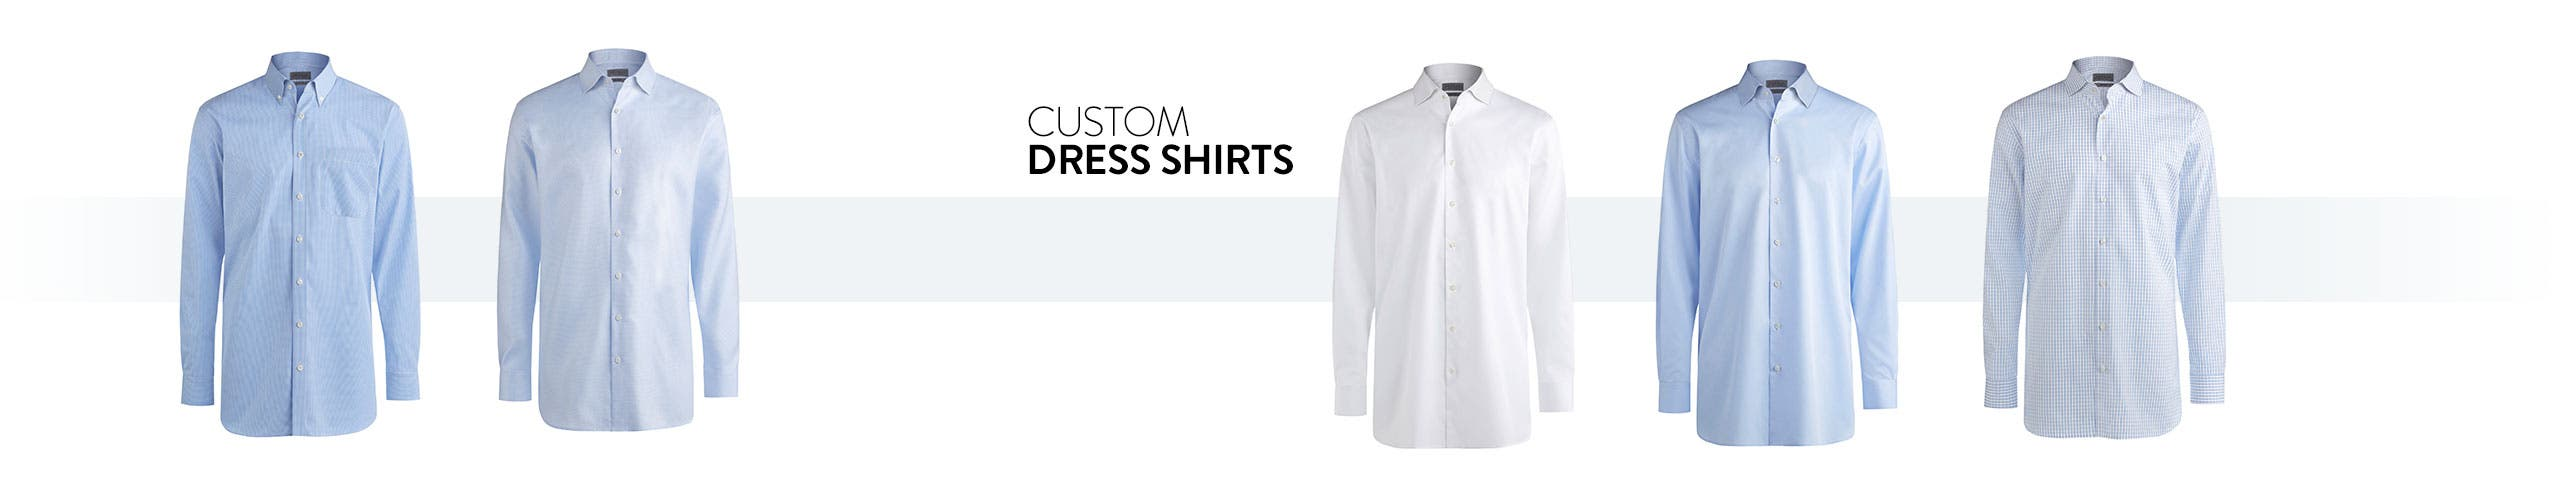 Now online: men's custom dress shirts.